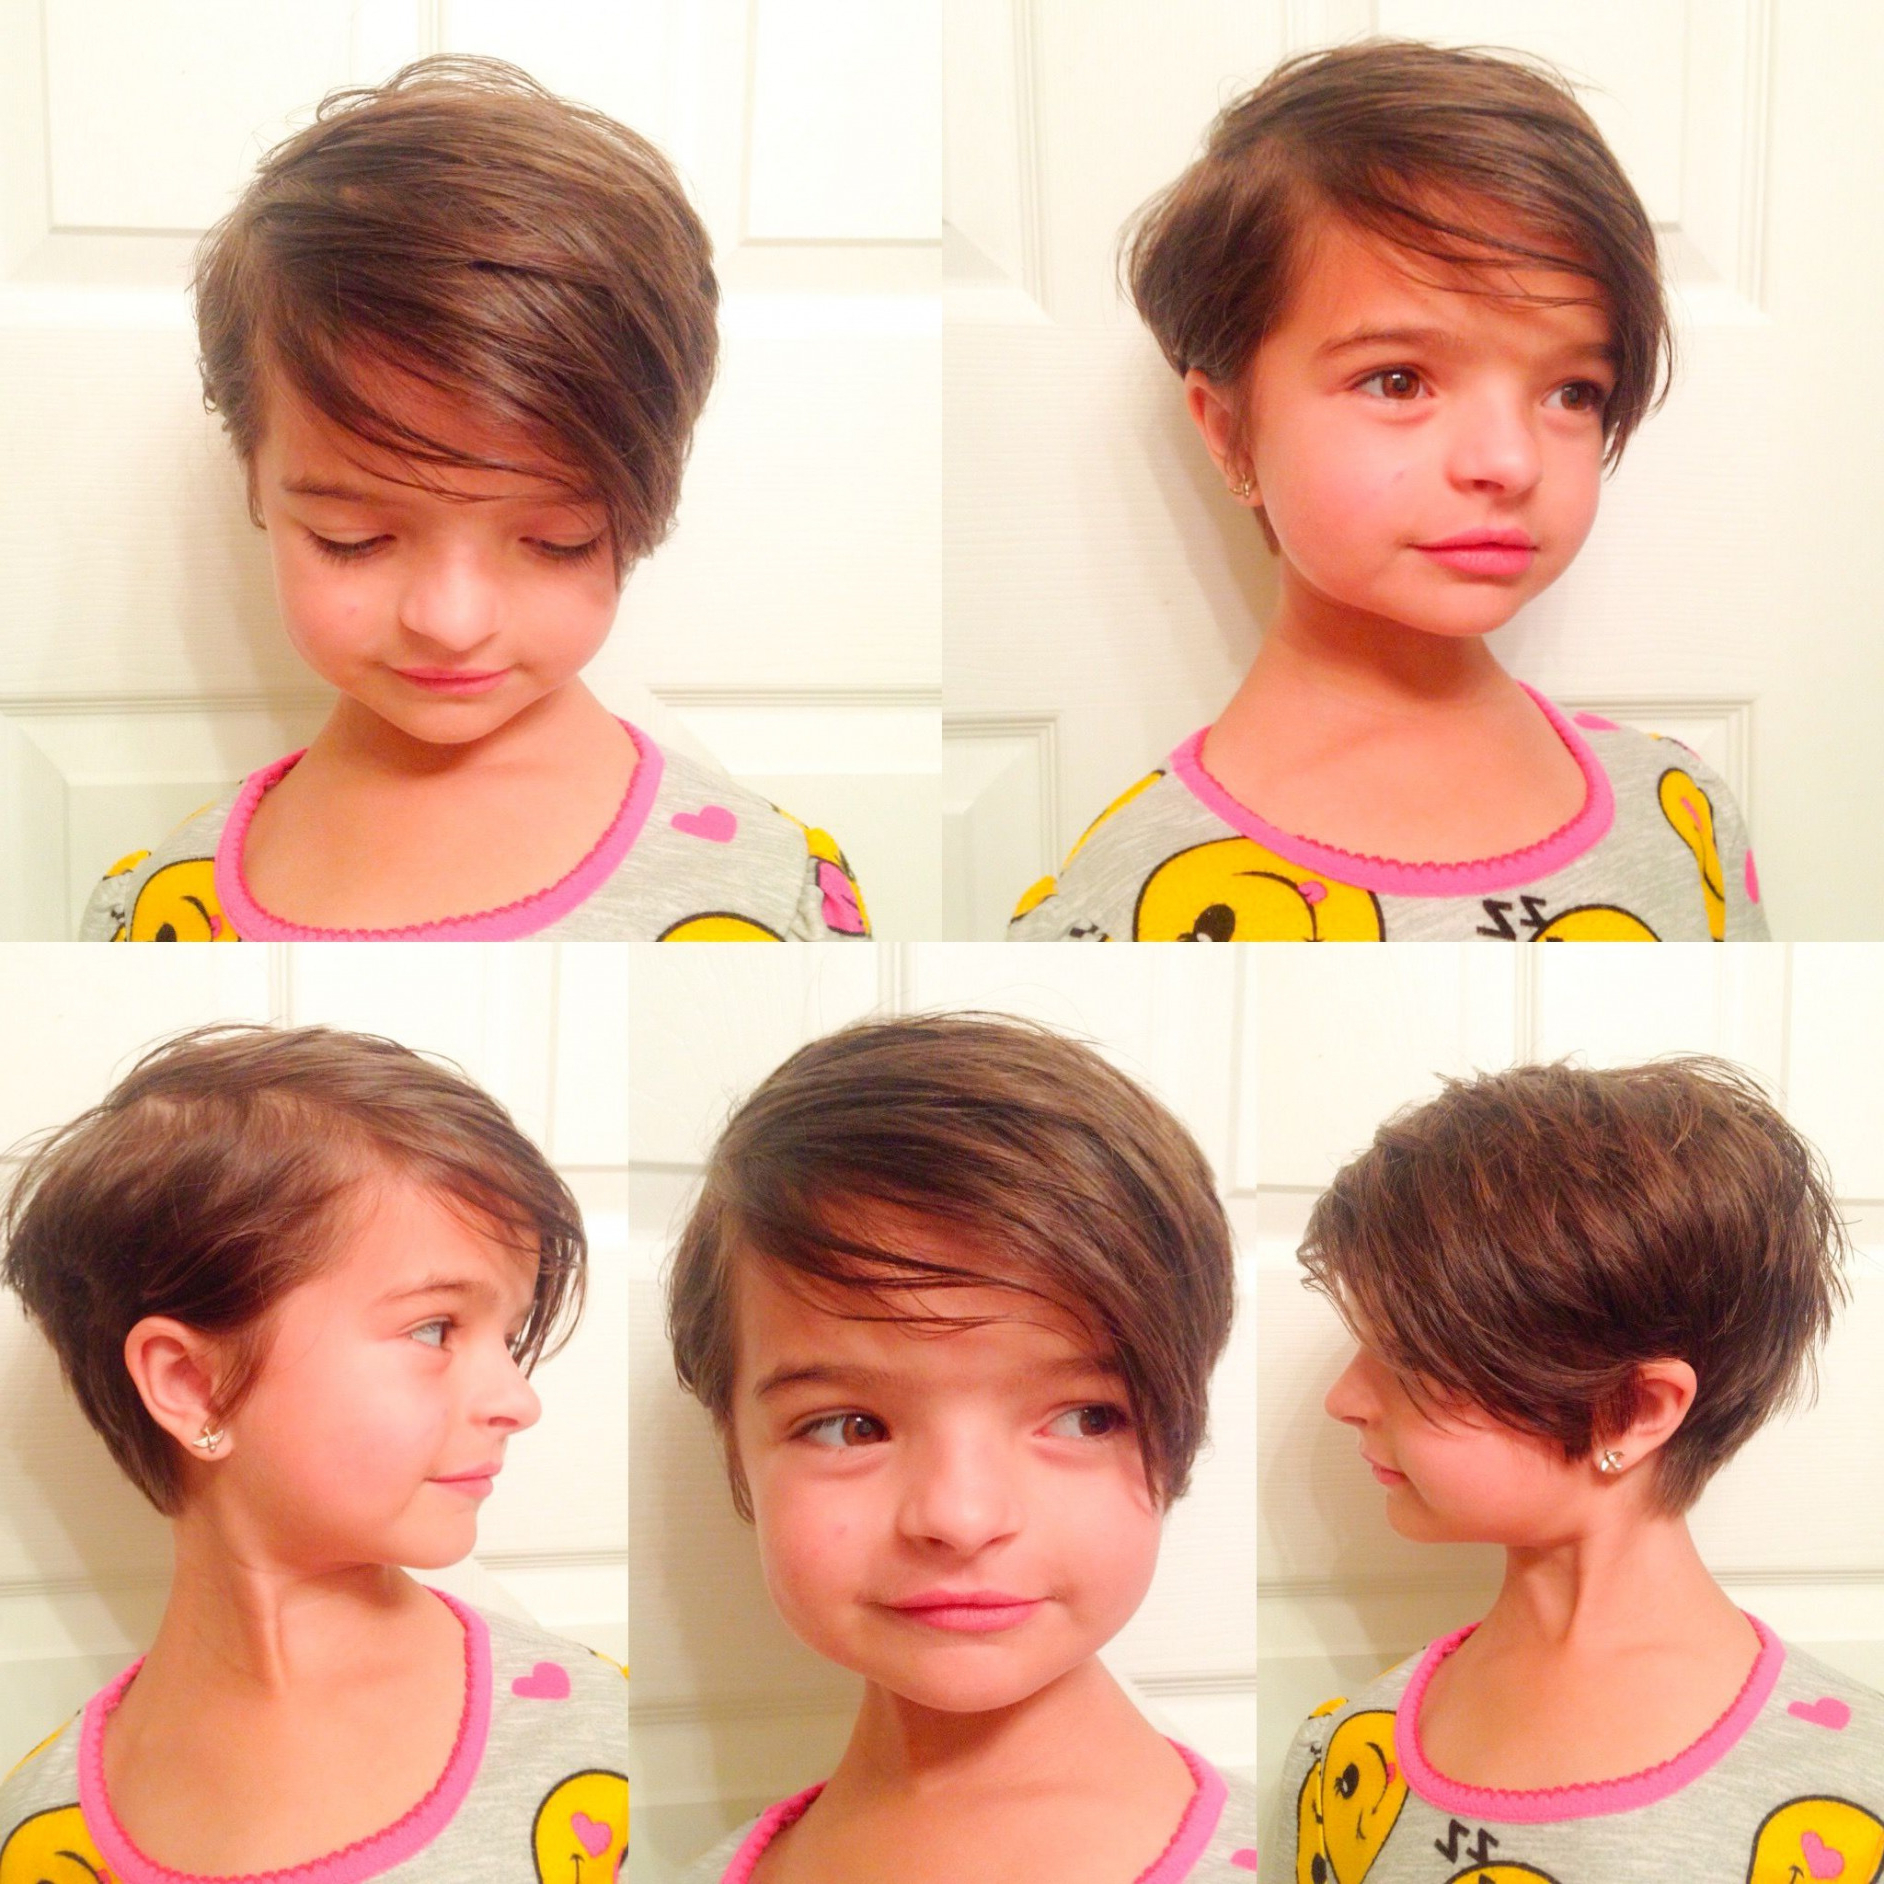 Best Of Little Girl S Haircut Little Girl S Hairstyle Pixie Cut Regarding Black Little Girl Short Hairstyles (View 17 of 25)